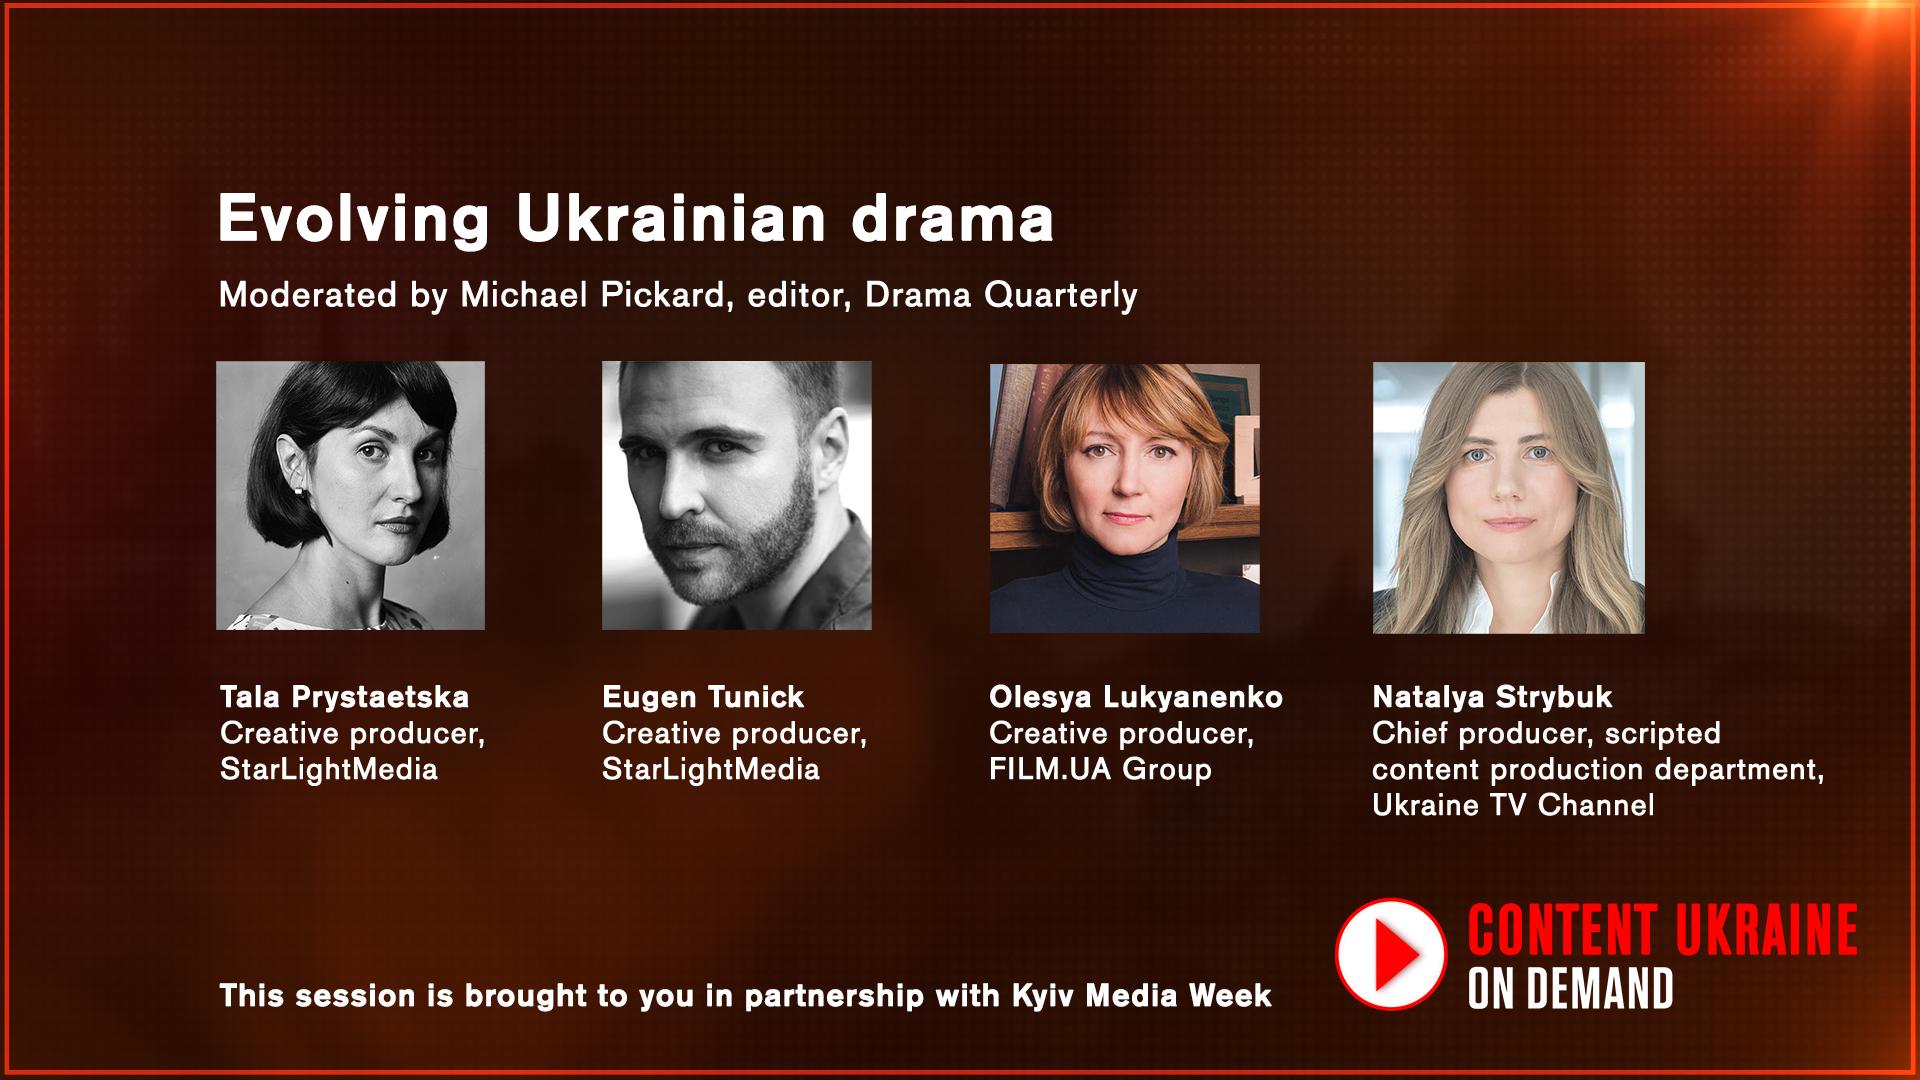 Evolving Ukrainian drama